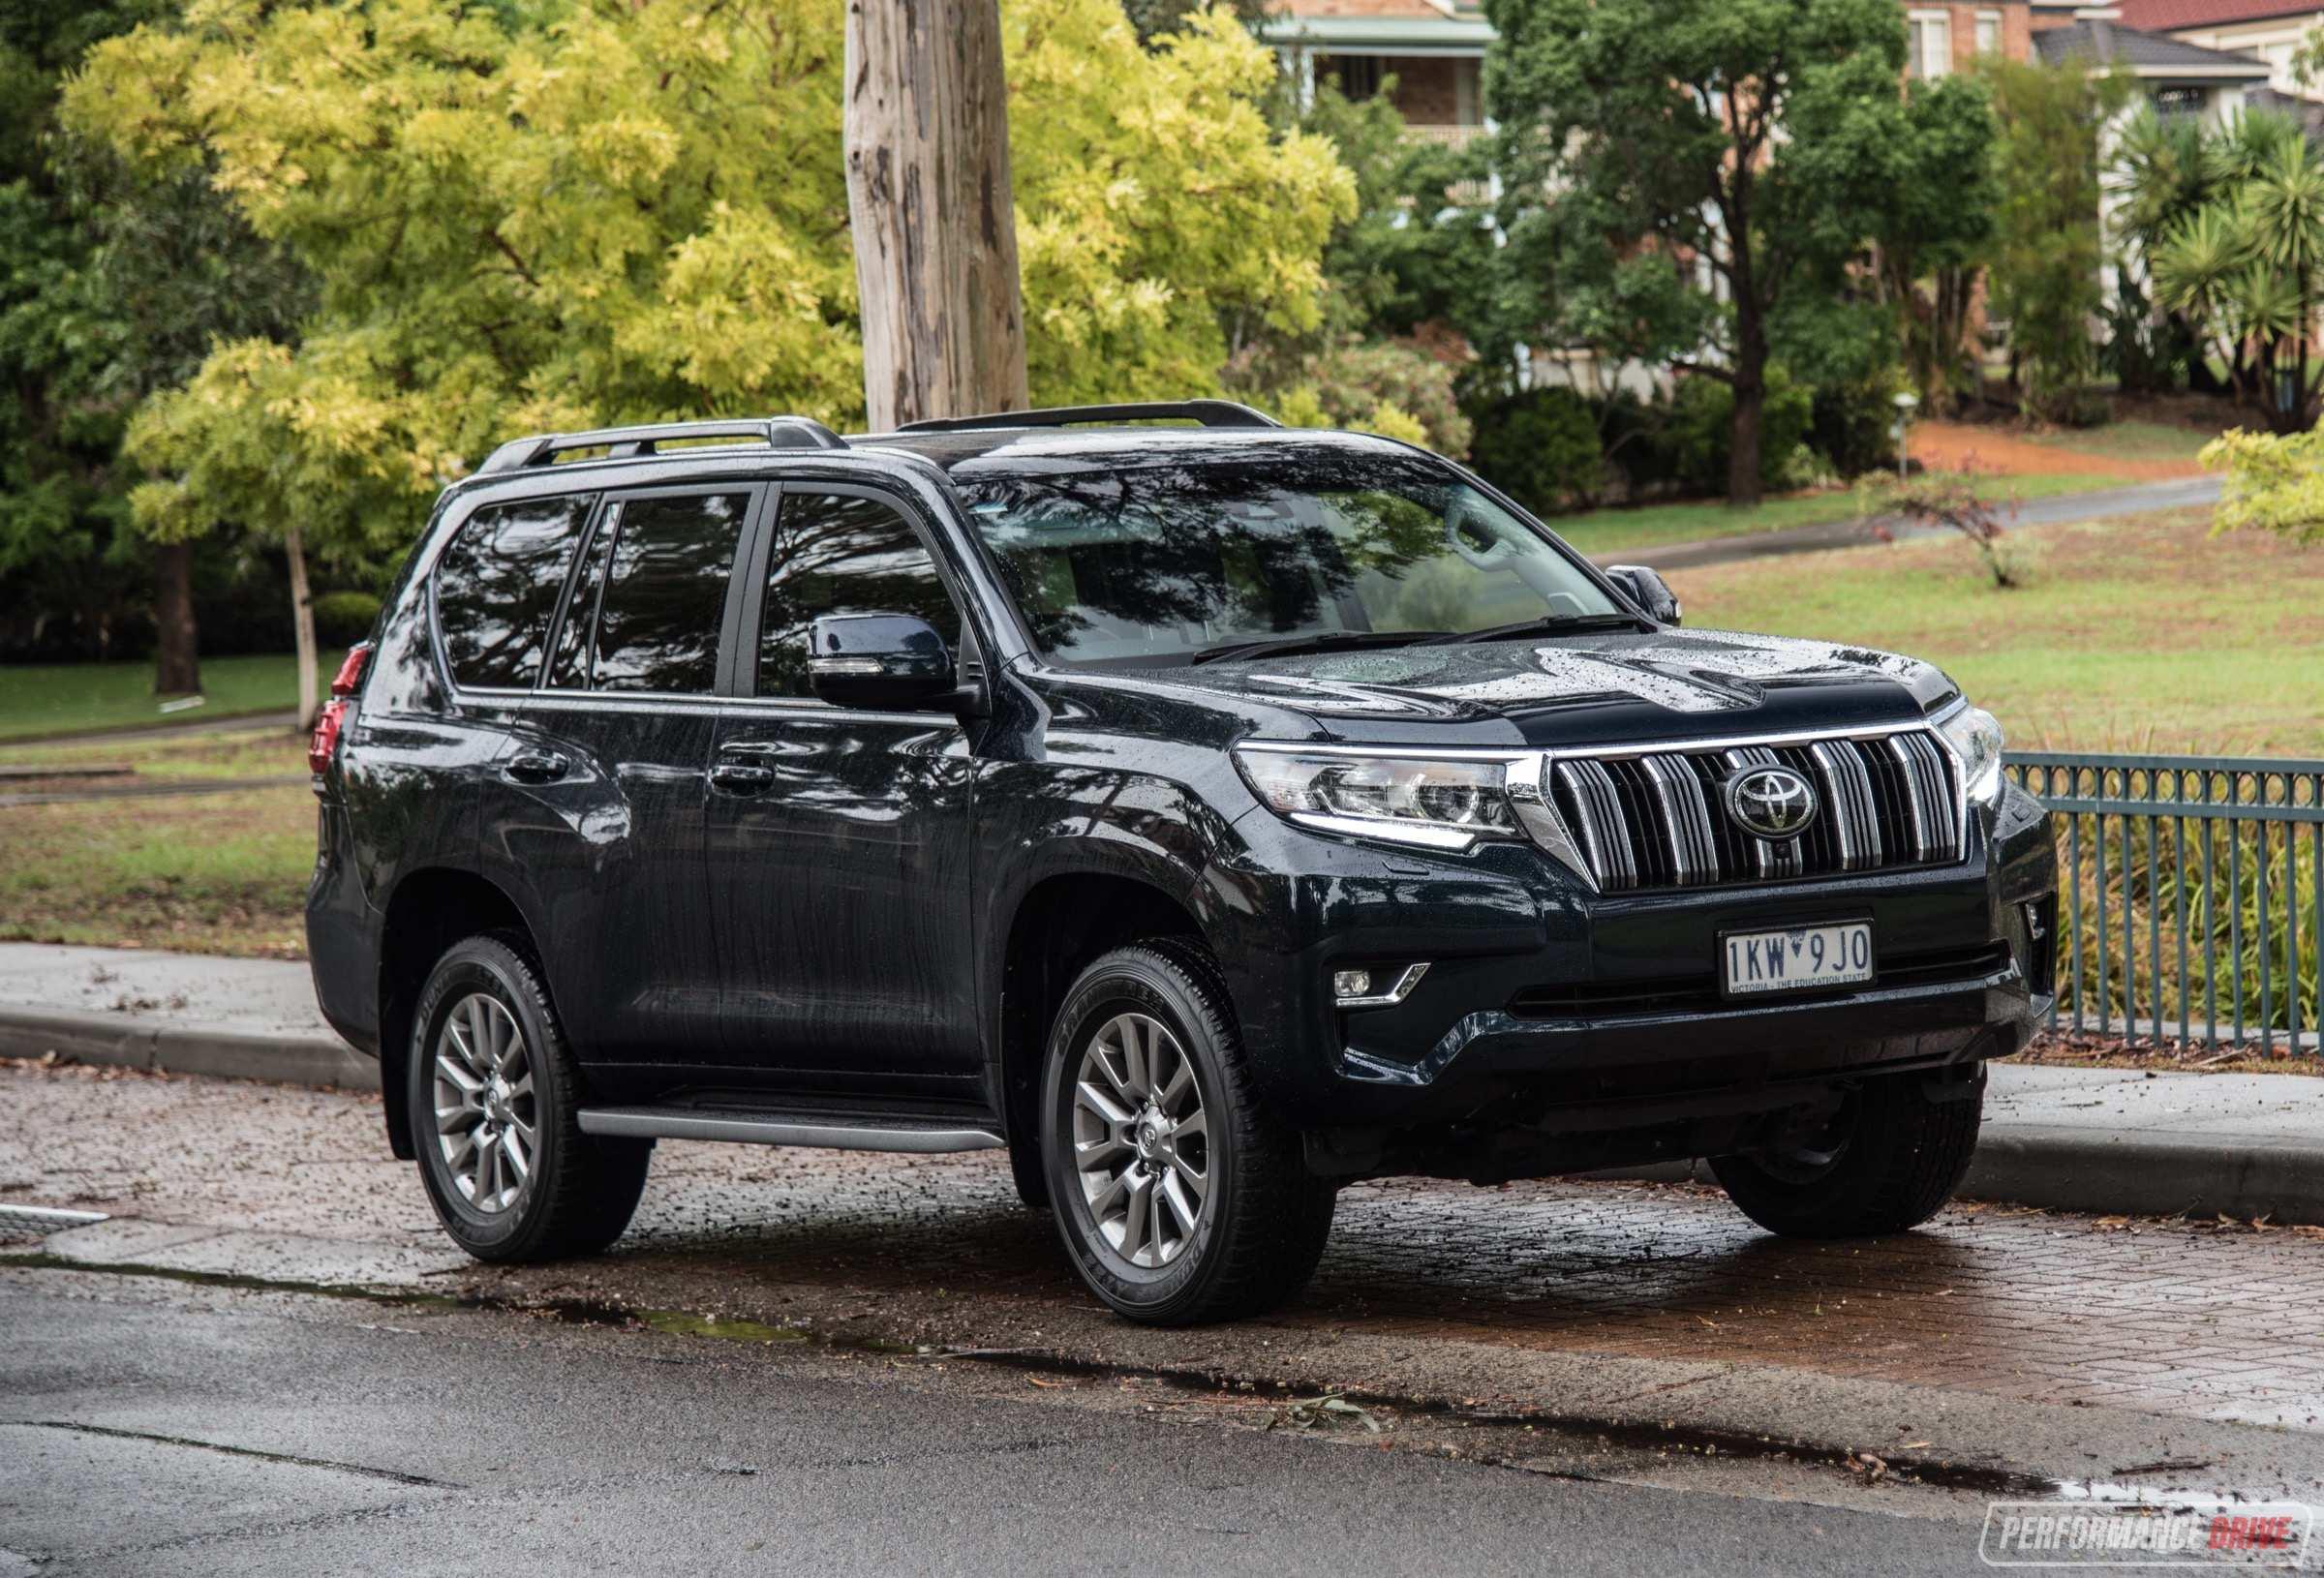 44 Best Review Toyota Prado 2019 Australia Prices by Toyota Prado 2019 Australia